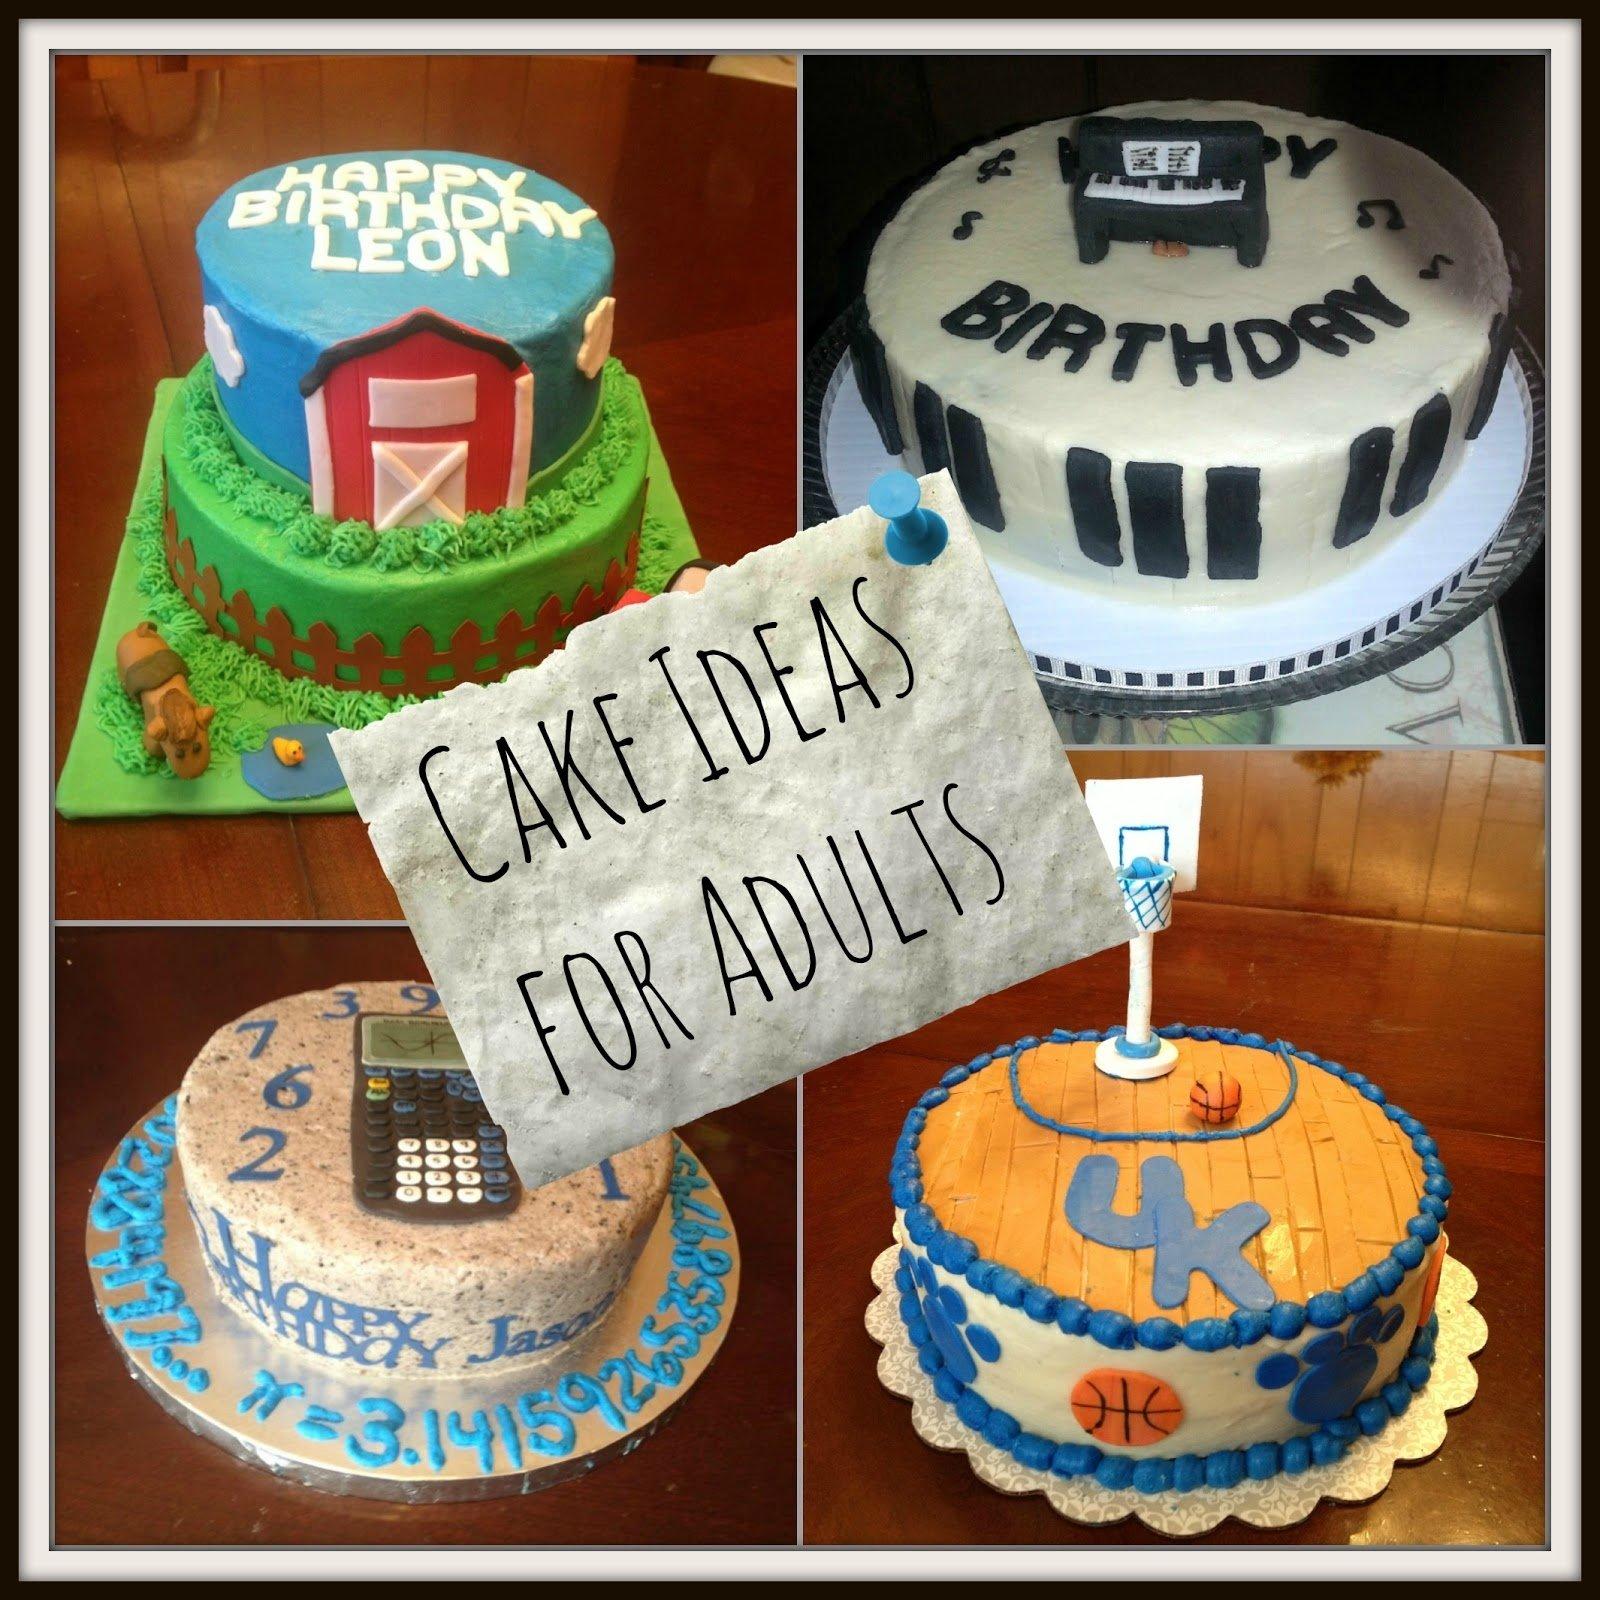 10 Gorgeous Birthday Cake Decorating Ideas For Adults birthday cake ideas for adults 2020